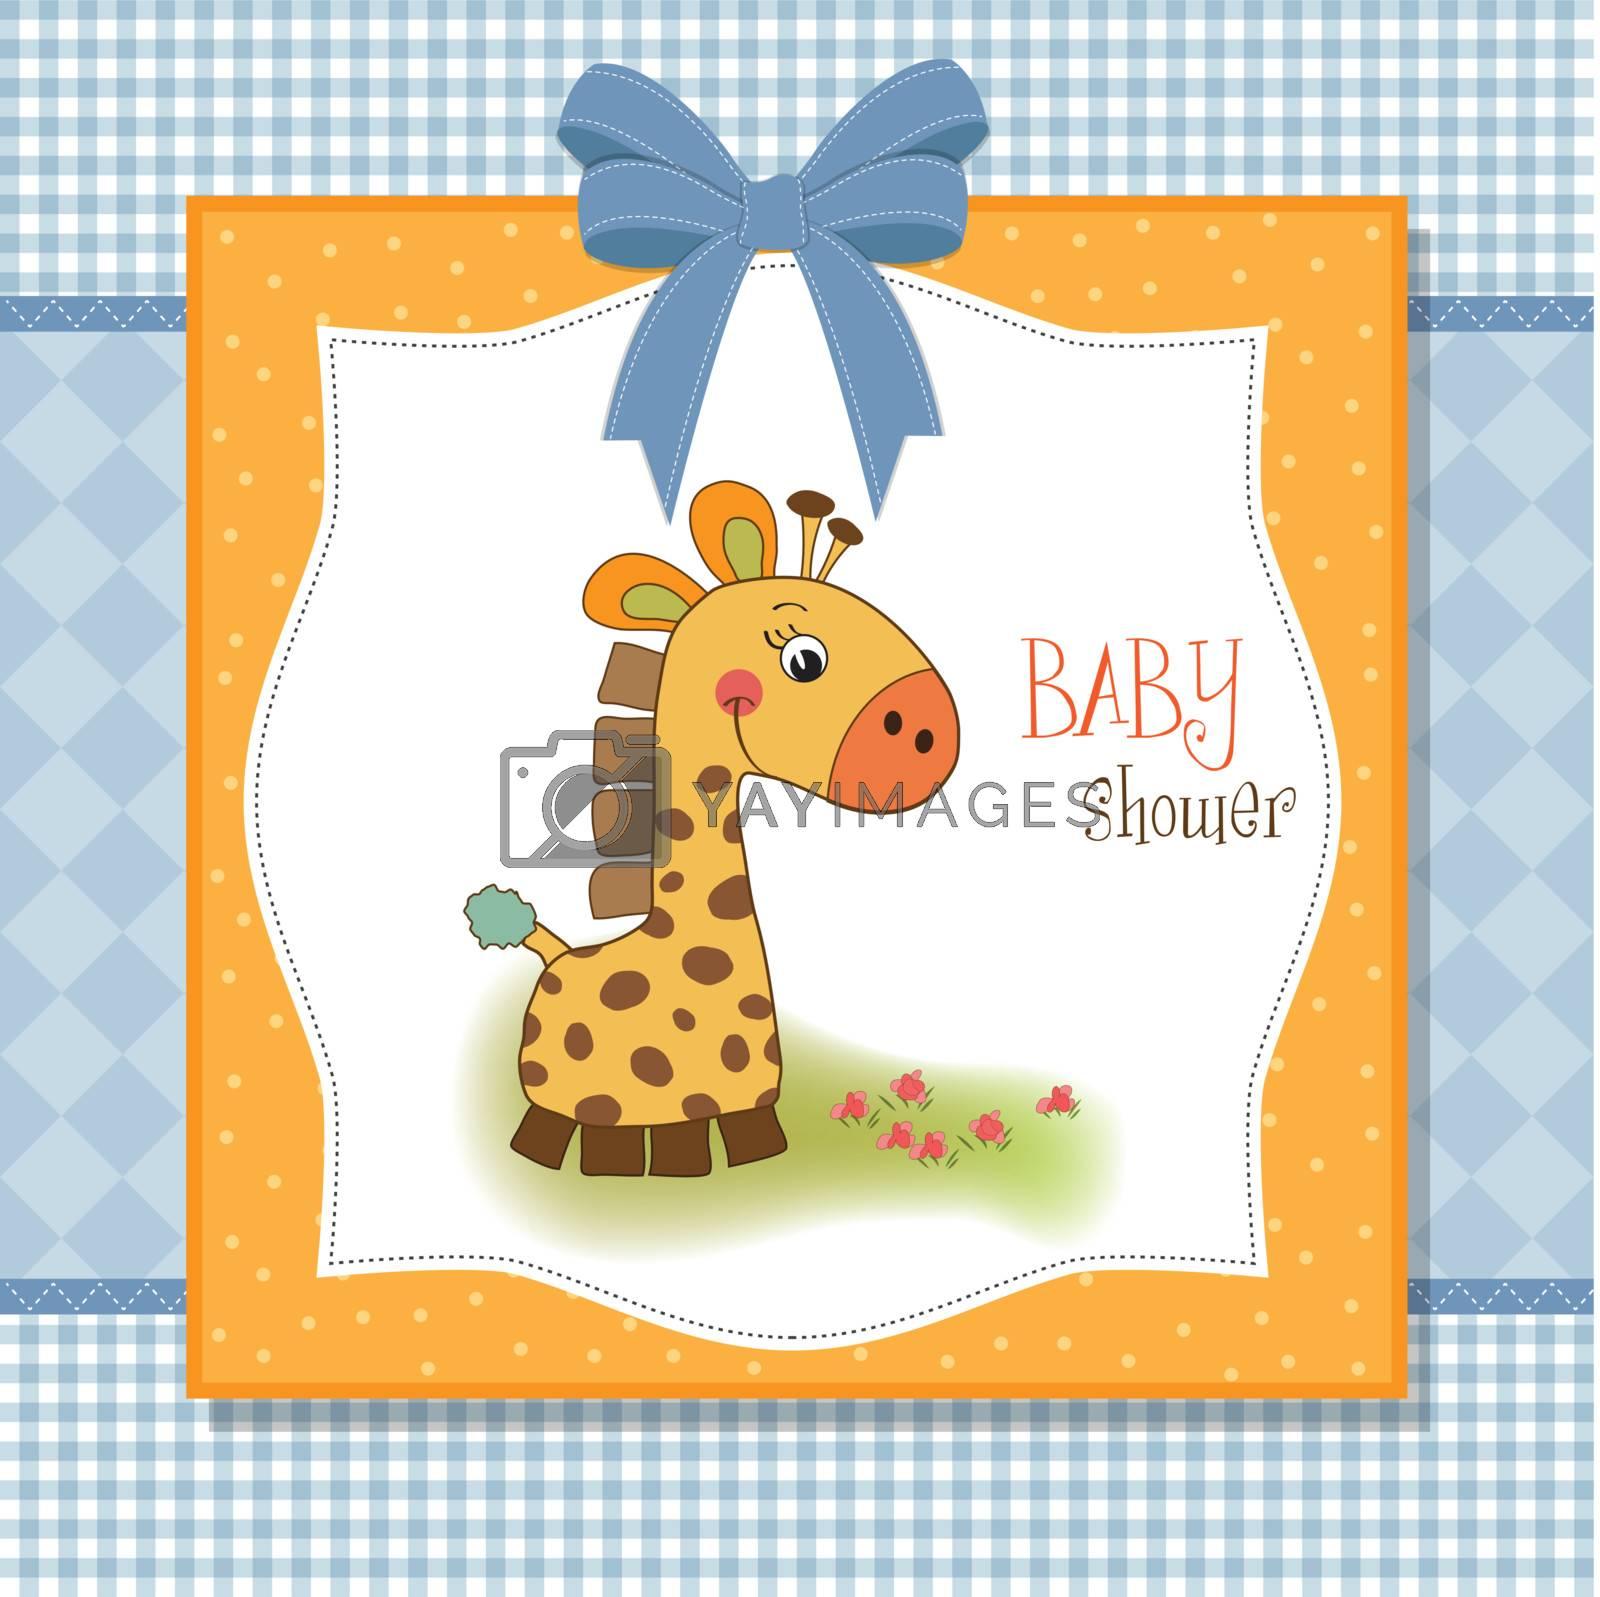 welcome baby card with giraffe